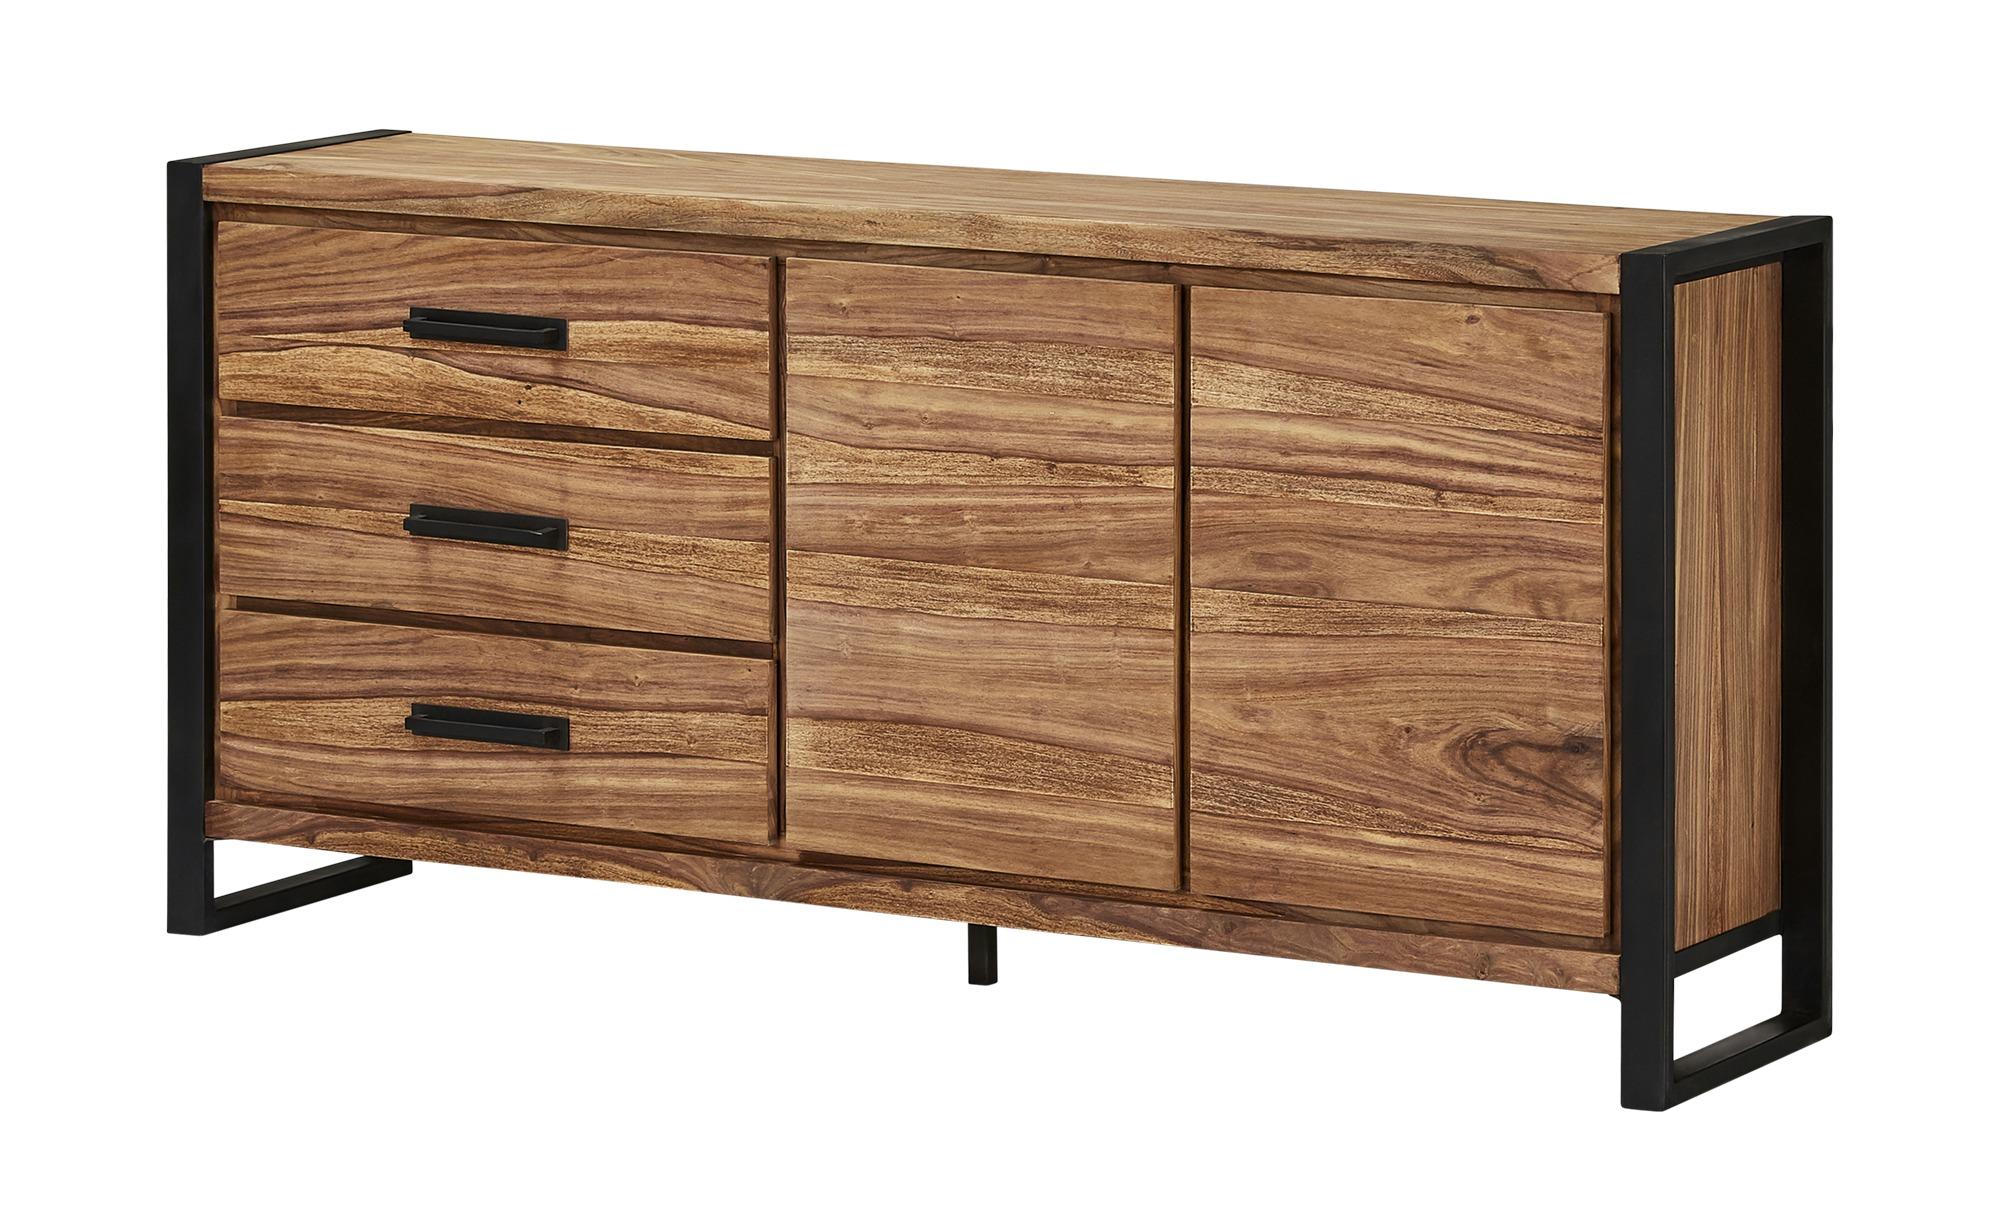 Gray & Jones Sideboard  Tierra Fuego ¦ holzfarben ¦ Maße (cm): B: 180 H: 85 T: 42 Kommoden & Sideboards > Sideboards - Höffner